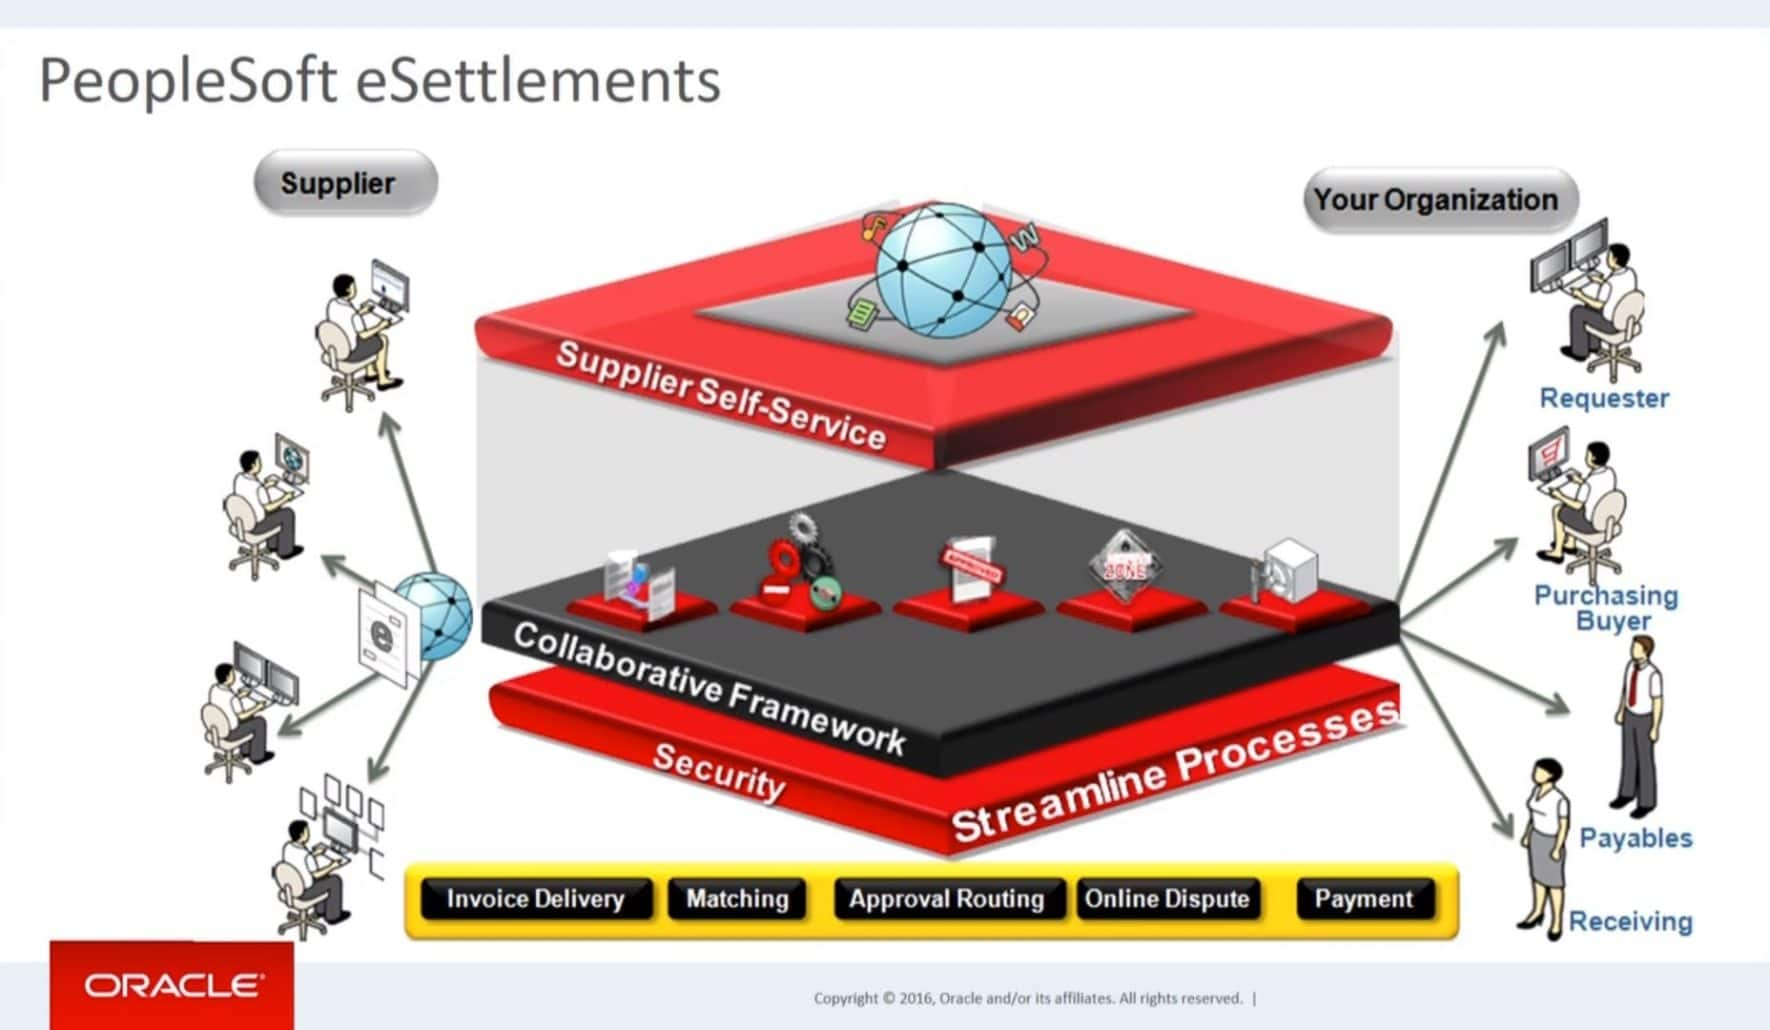 PeopleSoft-eSettlements